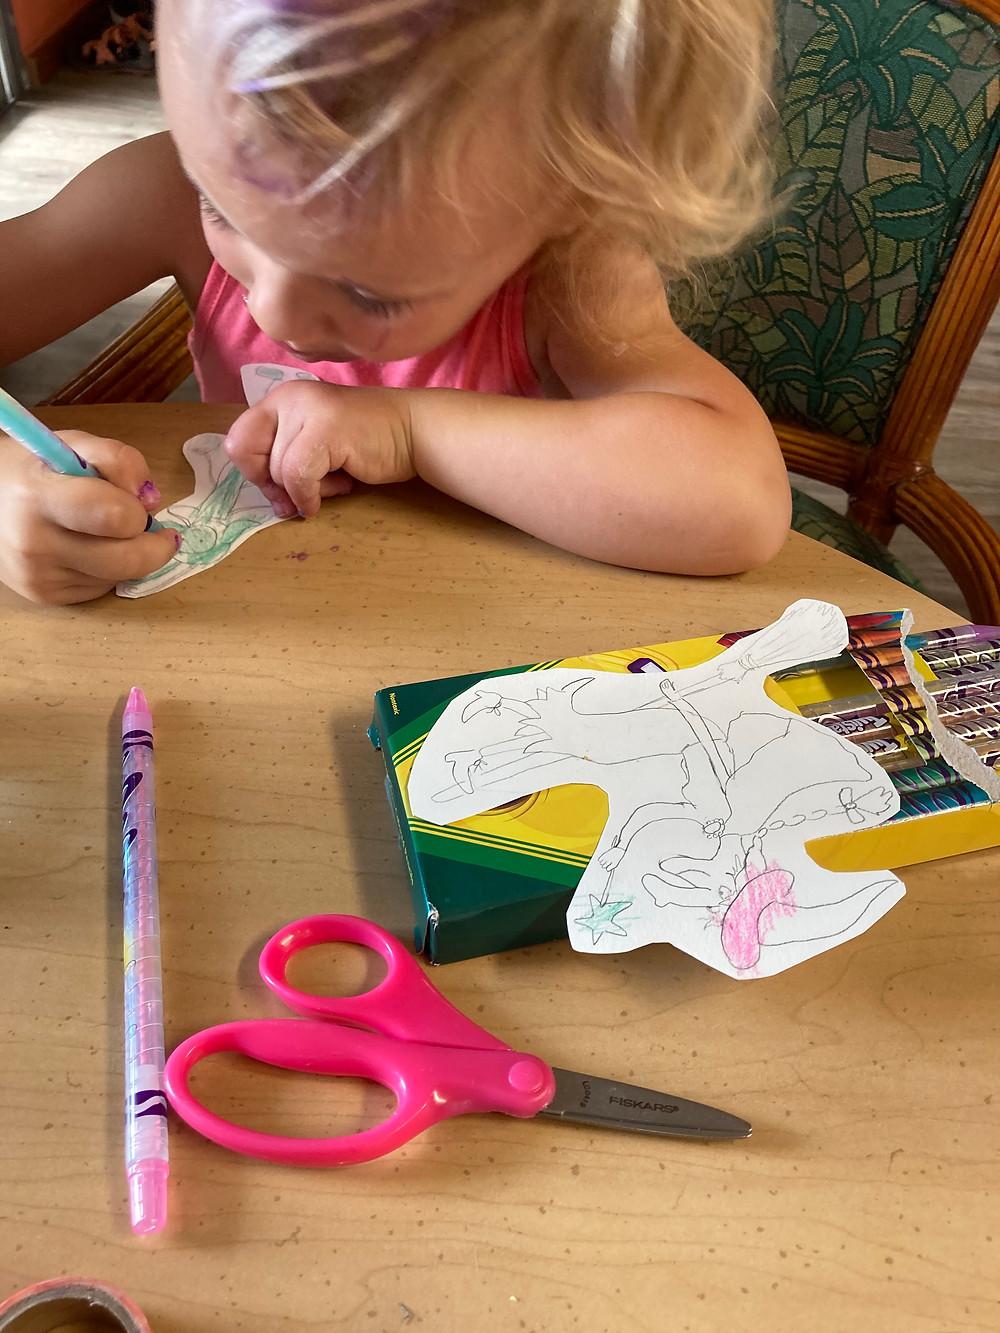 HG (3yo) coloring a favorite book character.